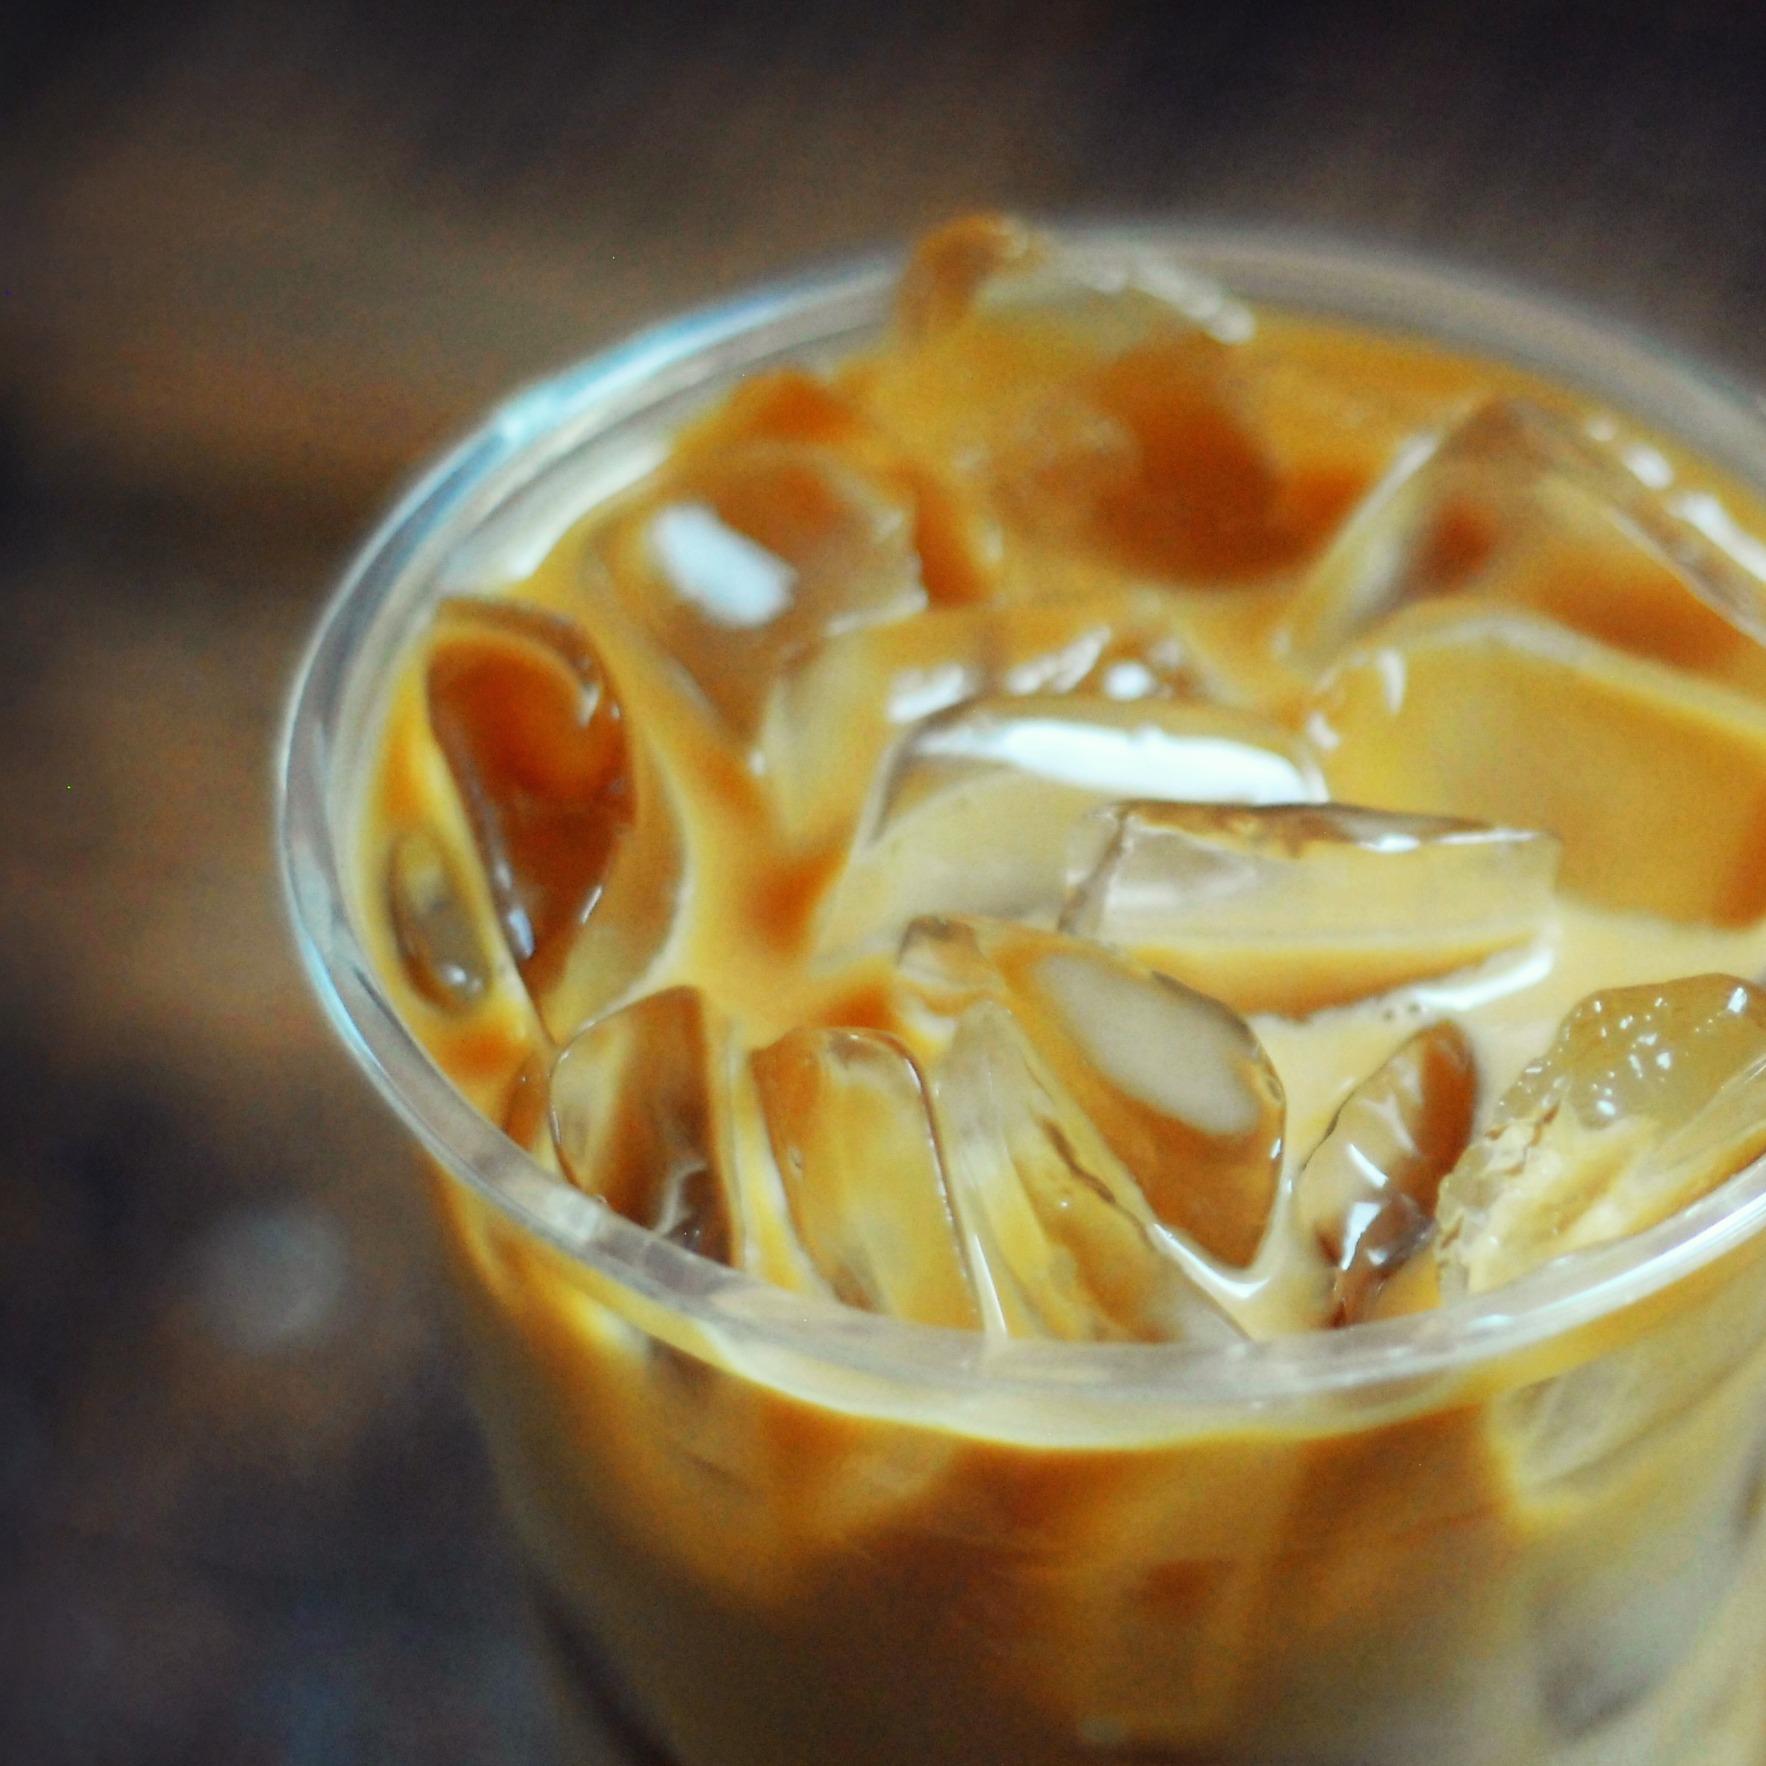 iced coffee with straw 3.jpg